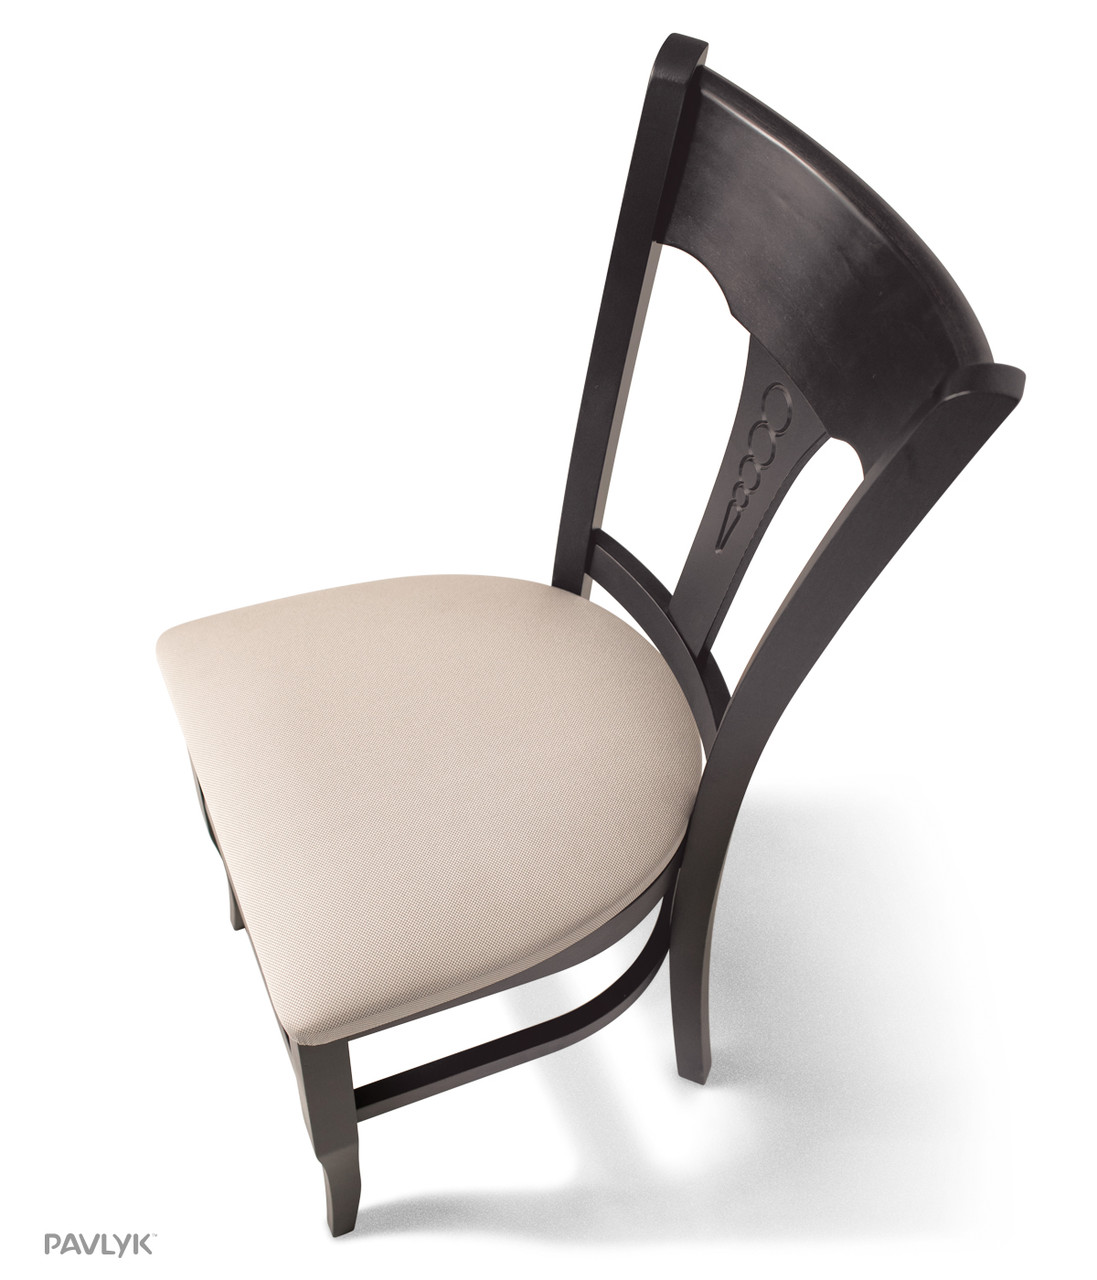 Деревянный стул МIA Pavlyk™